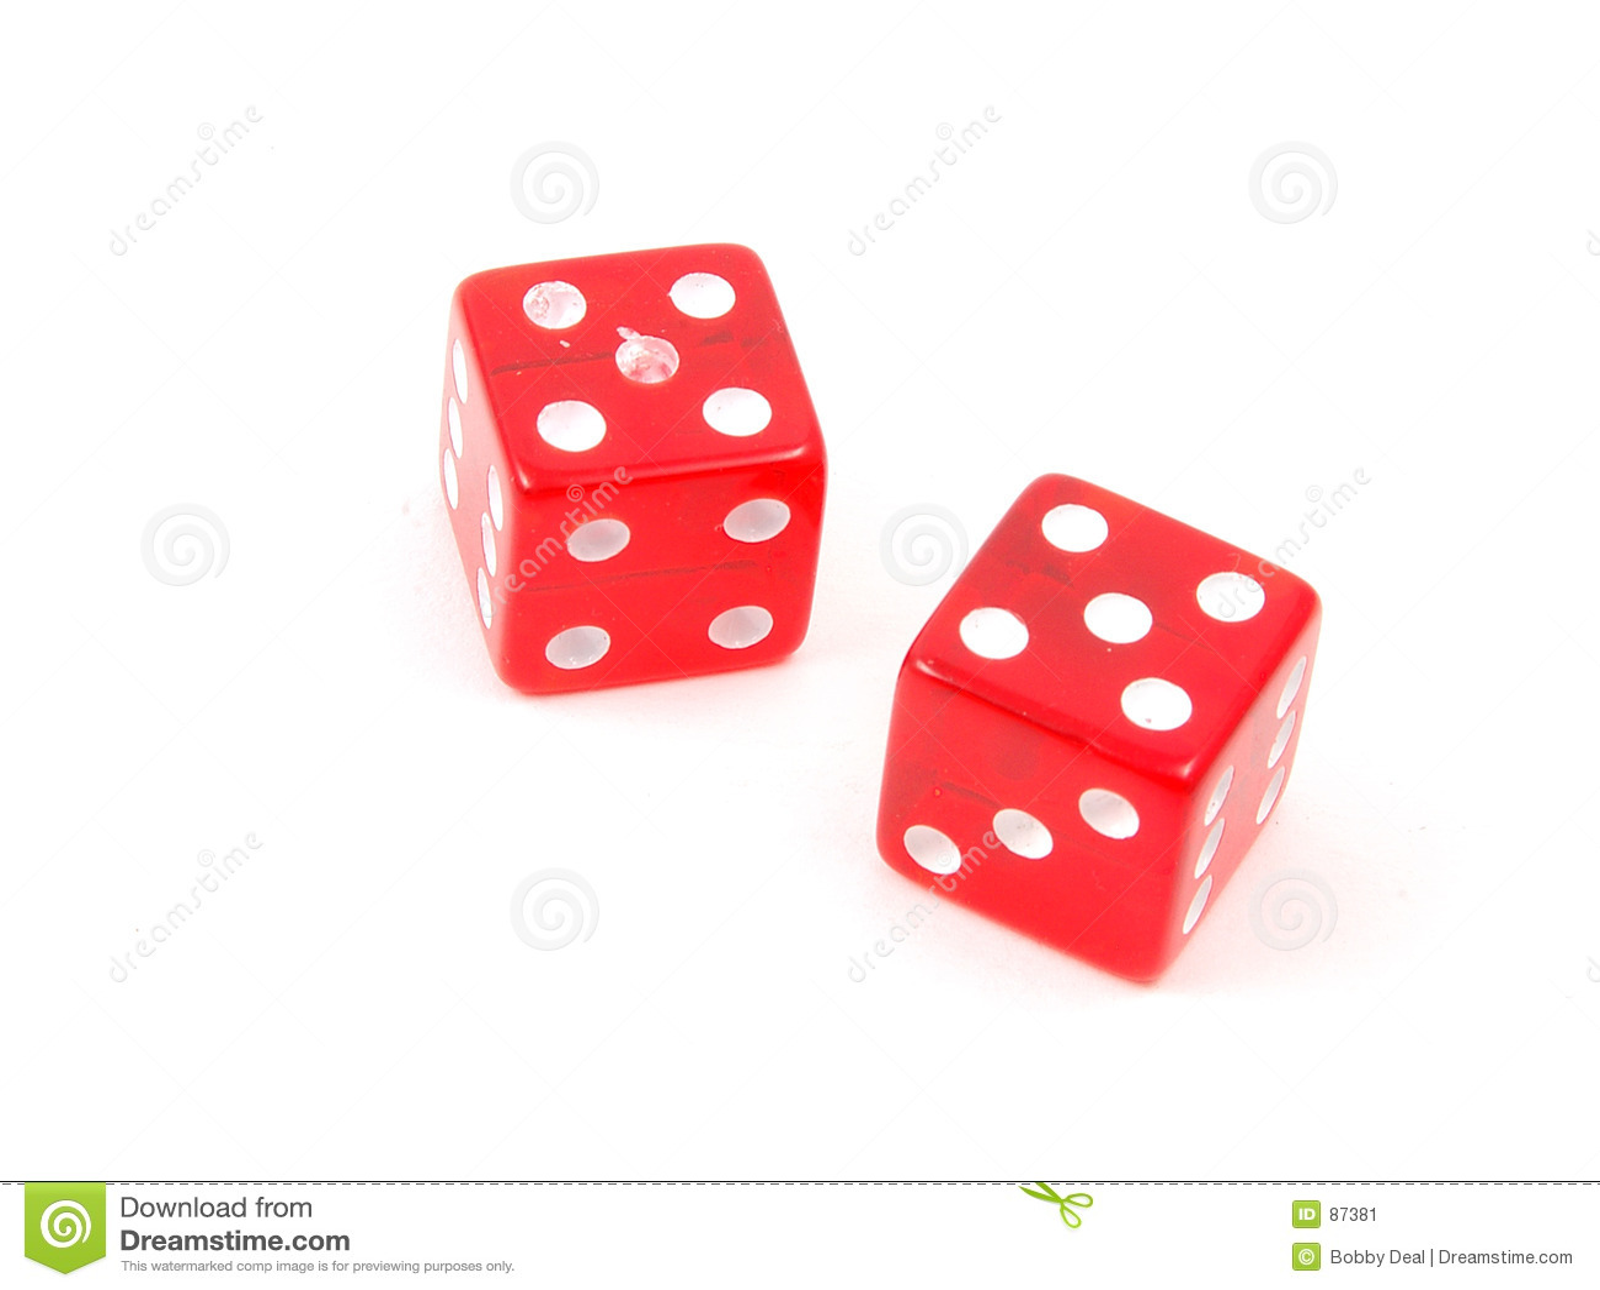 1 craps χωρίζει σε τετράγωνα